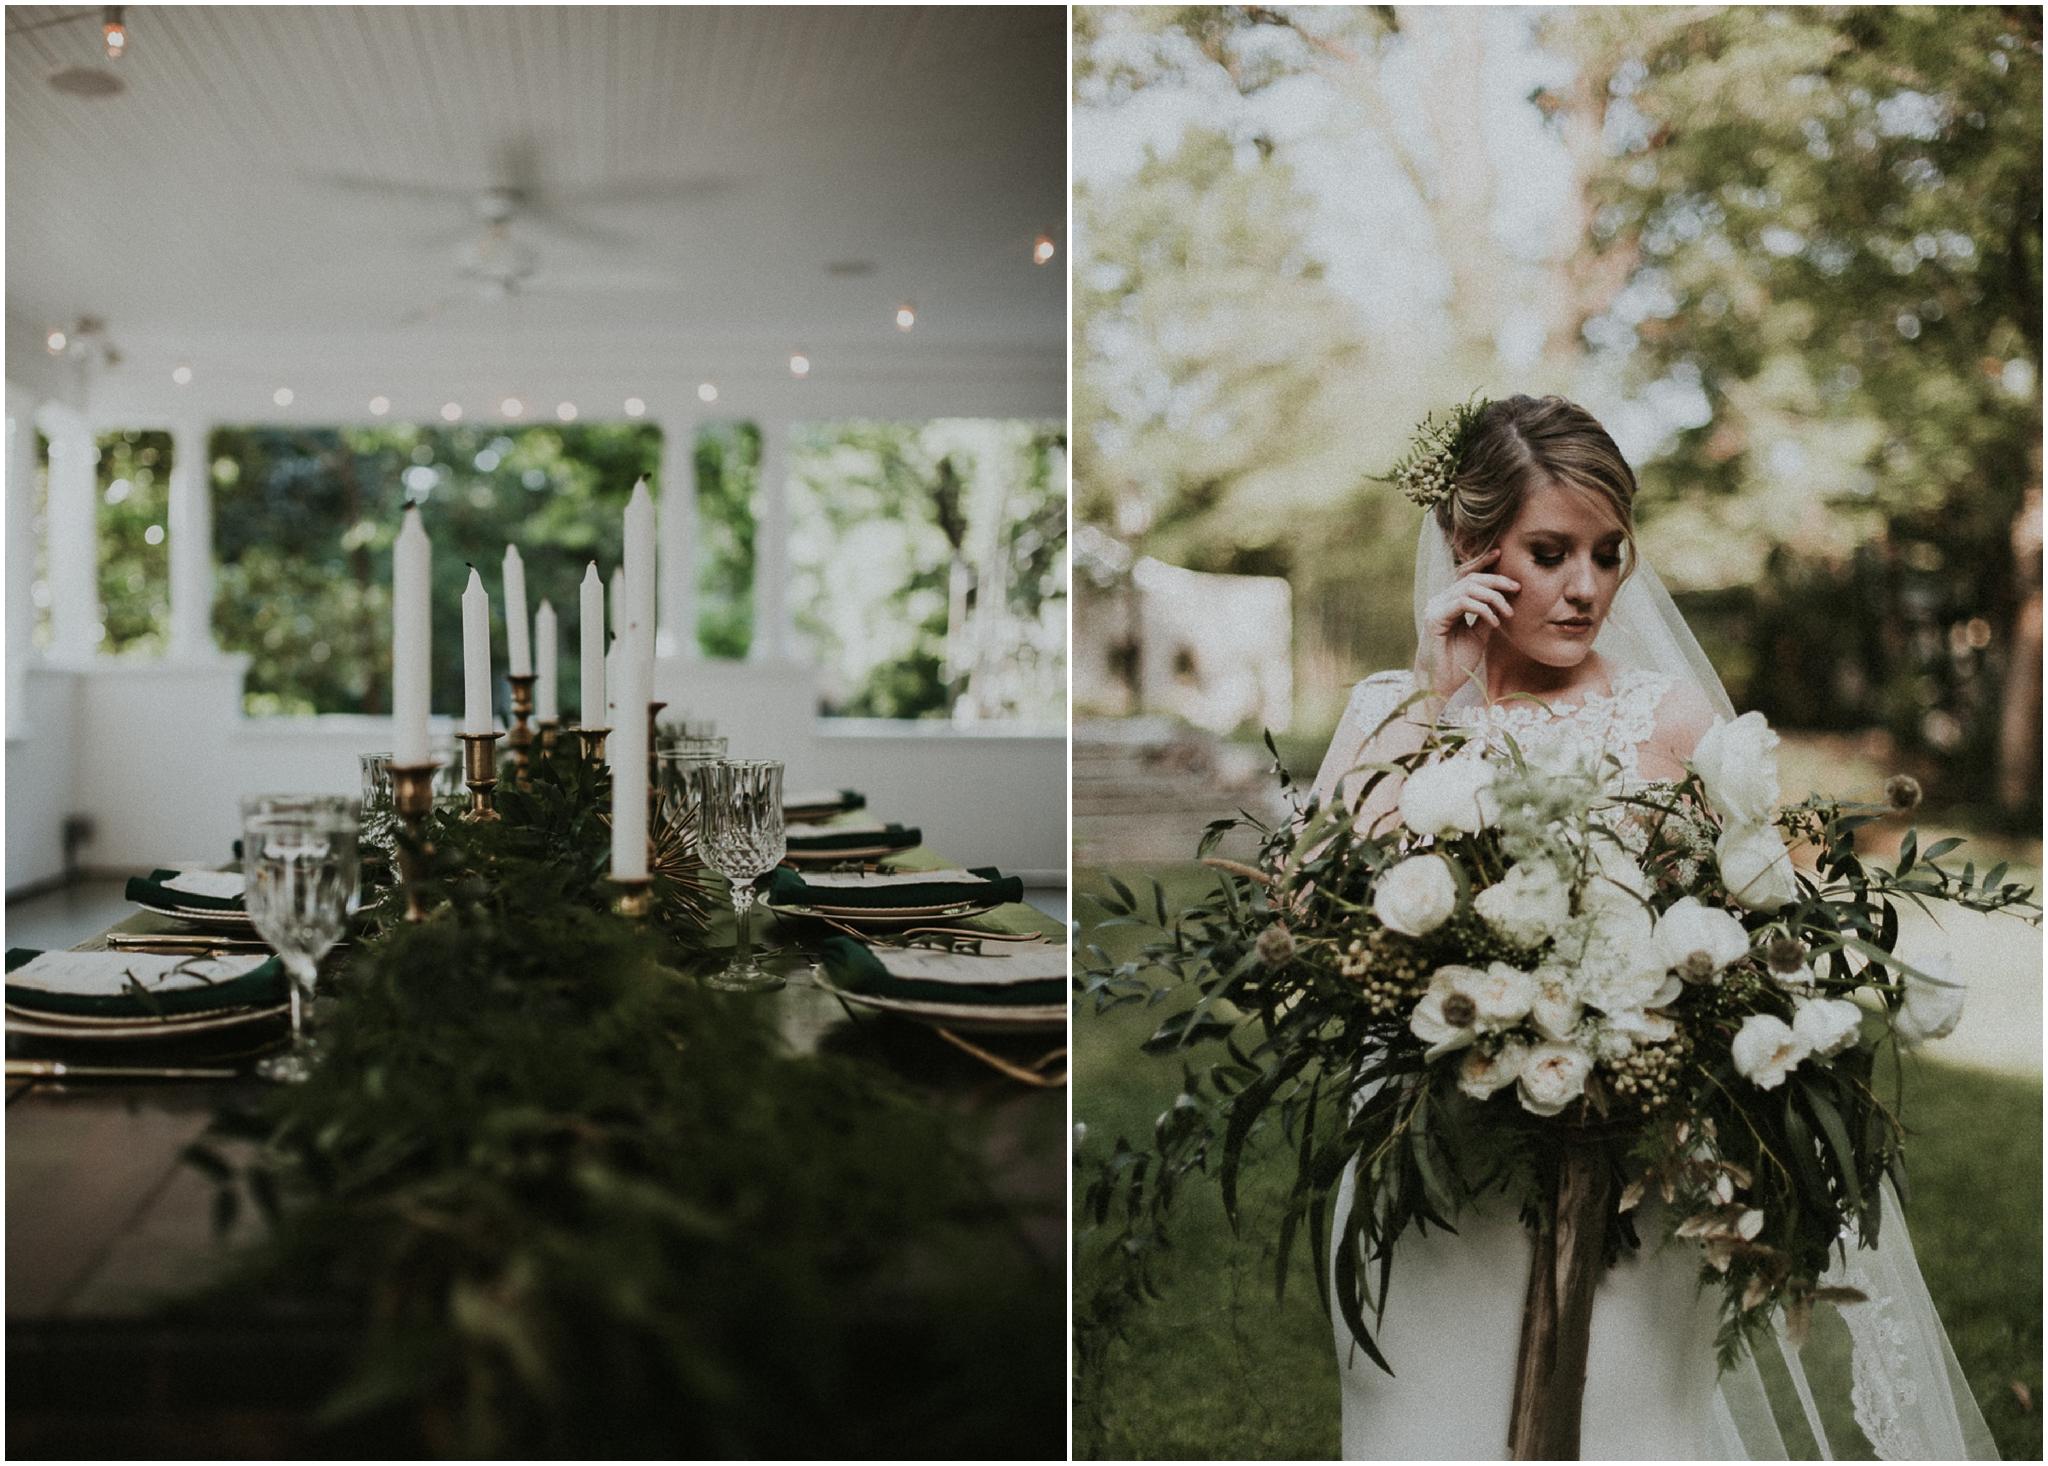 Wedding-photographer-ritchie-hill_0012.jpg